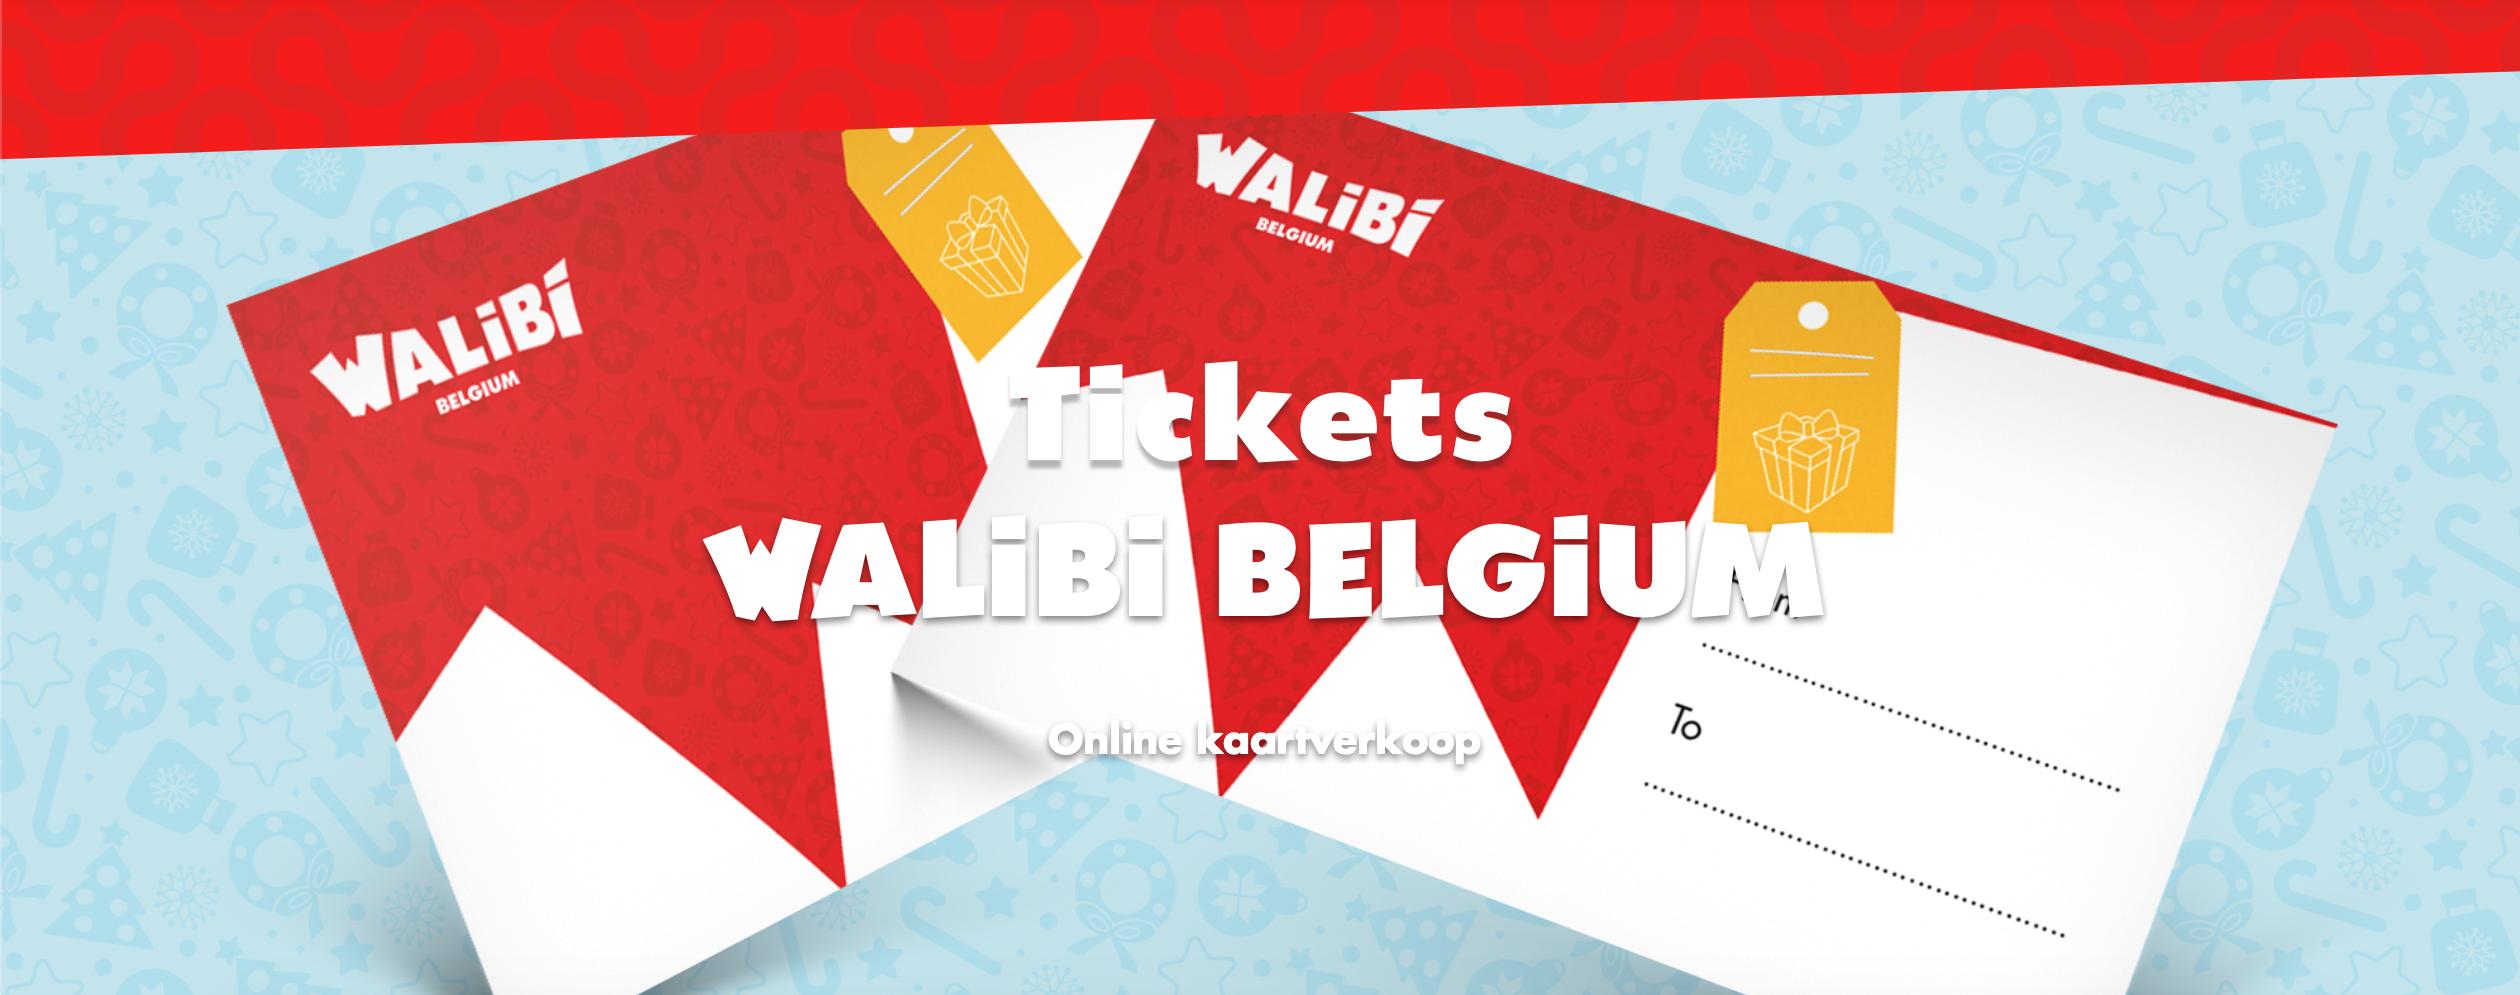 PROMO: Walibi Ticket Volwassene